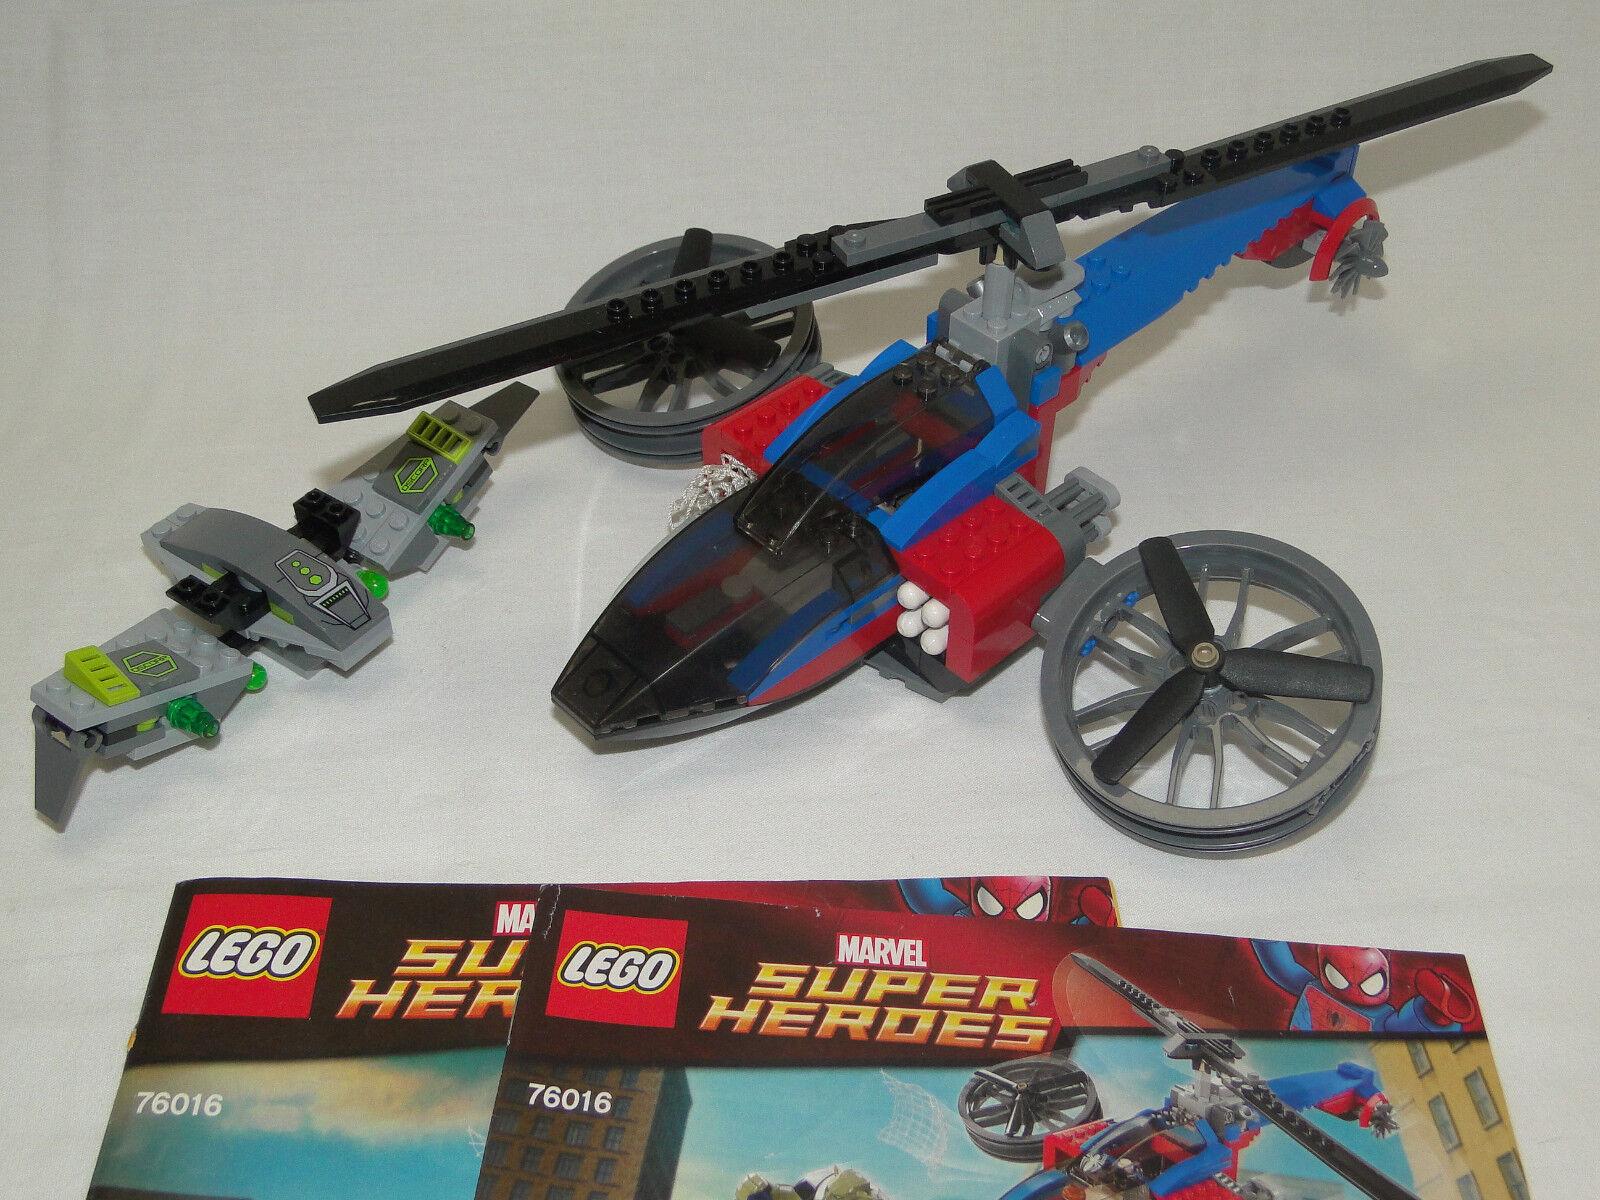 Lego Lego Lego Marvel Super Heroes 76016 Rettung Spider Helicopter mit OBA ohne Figuren 997d96